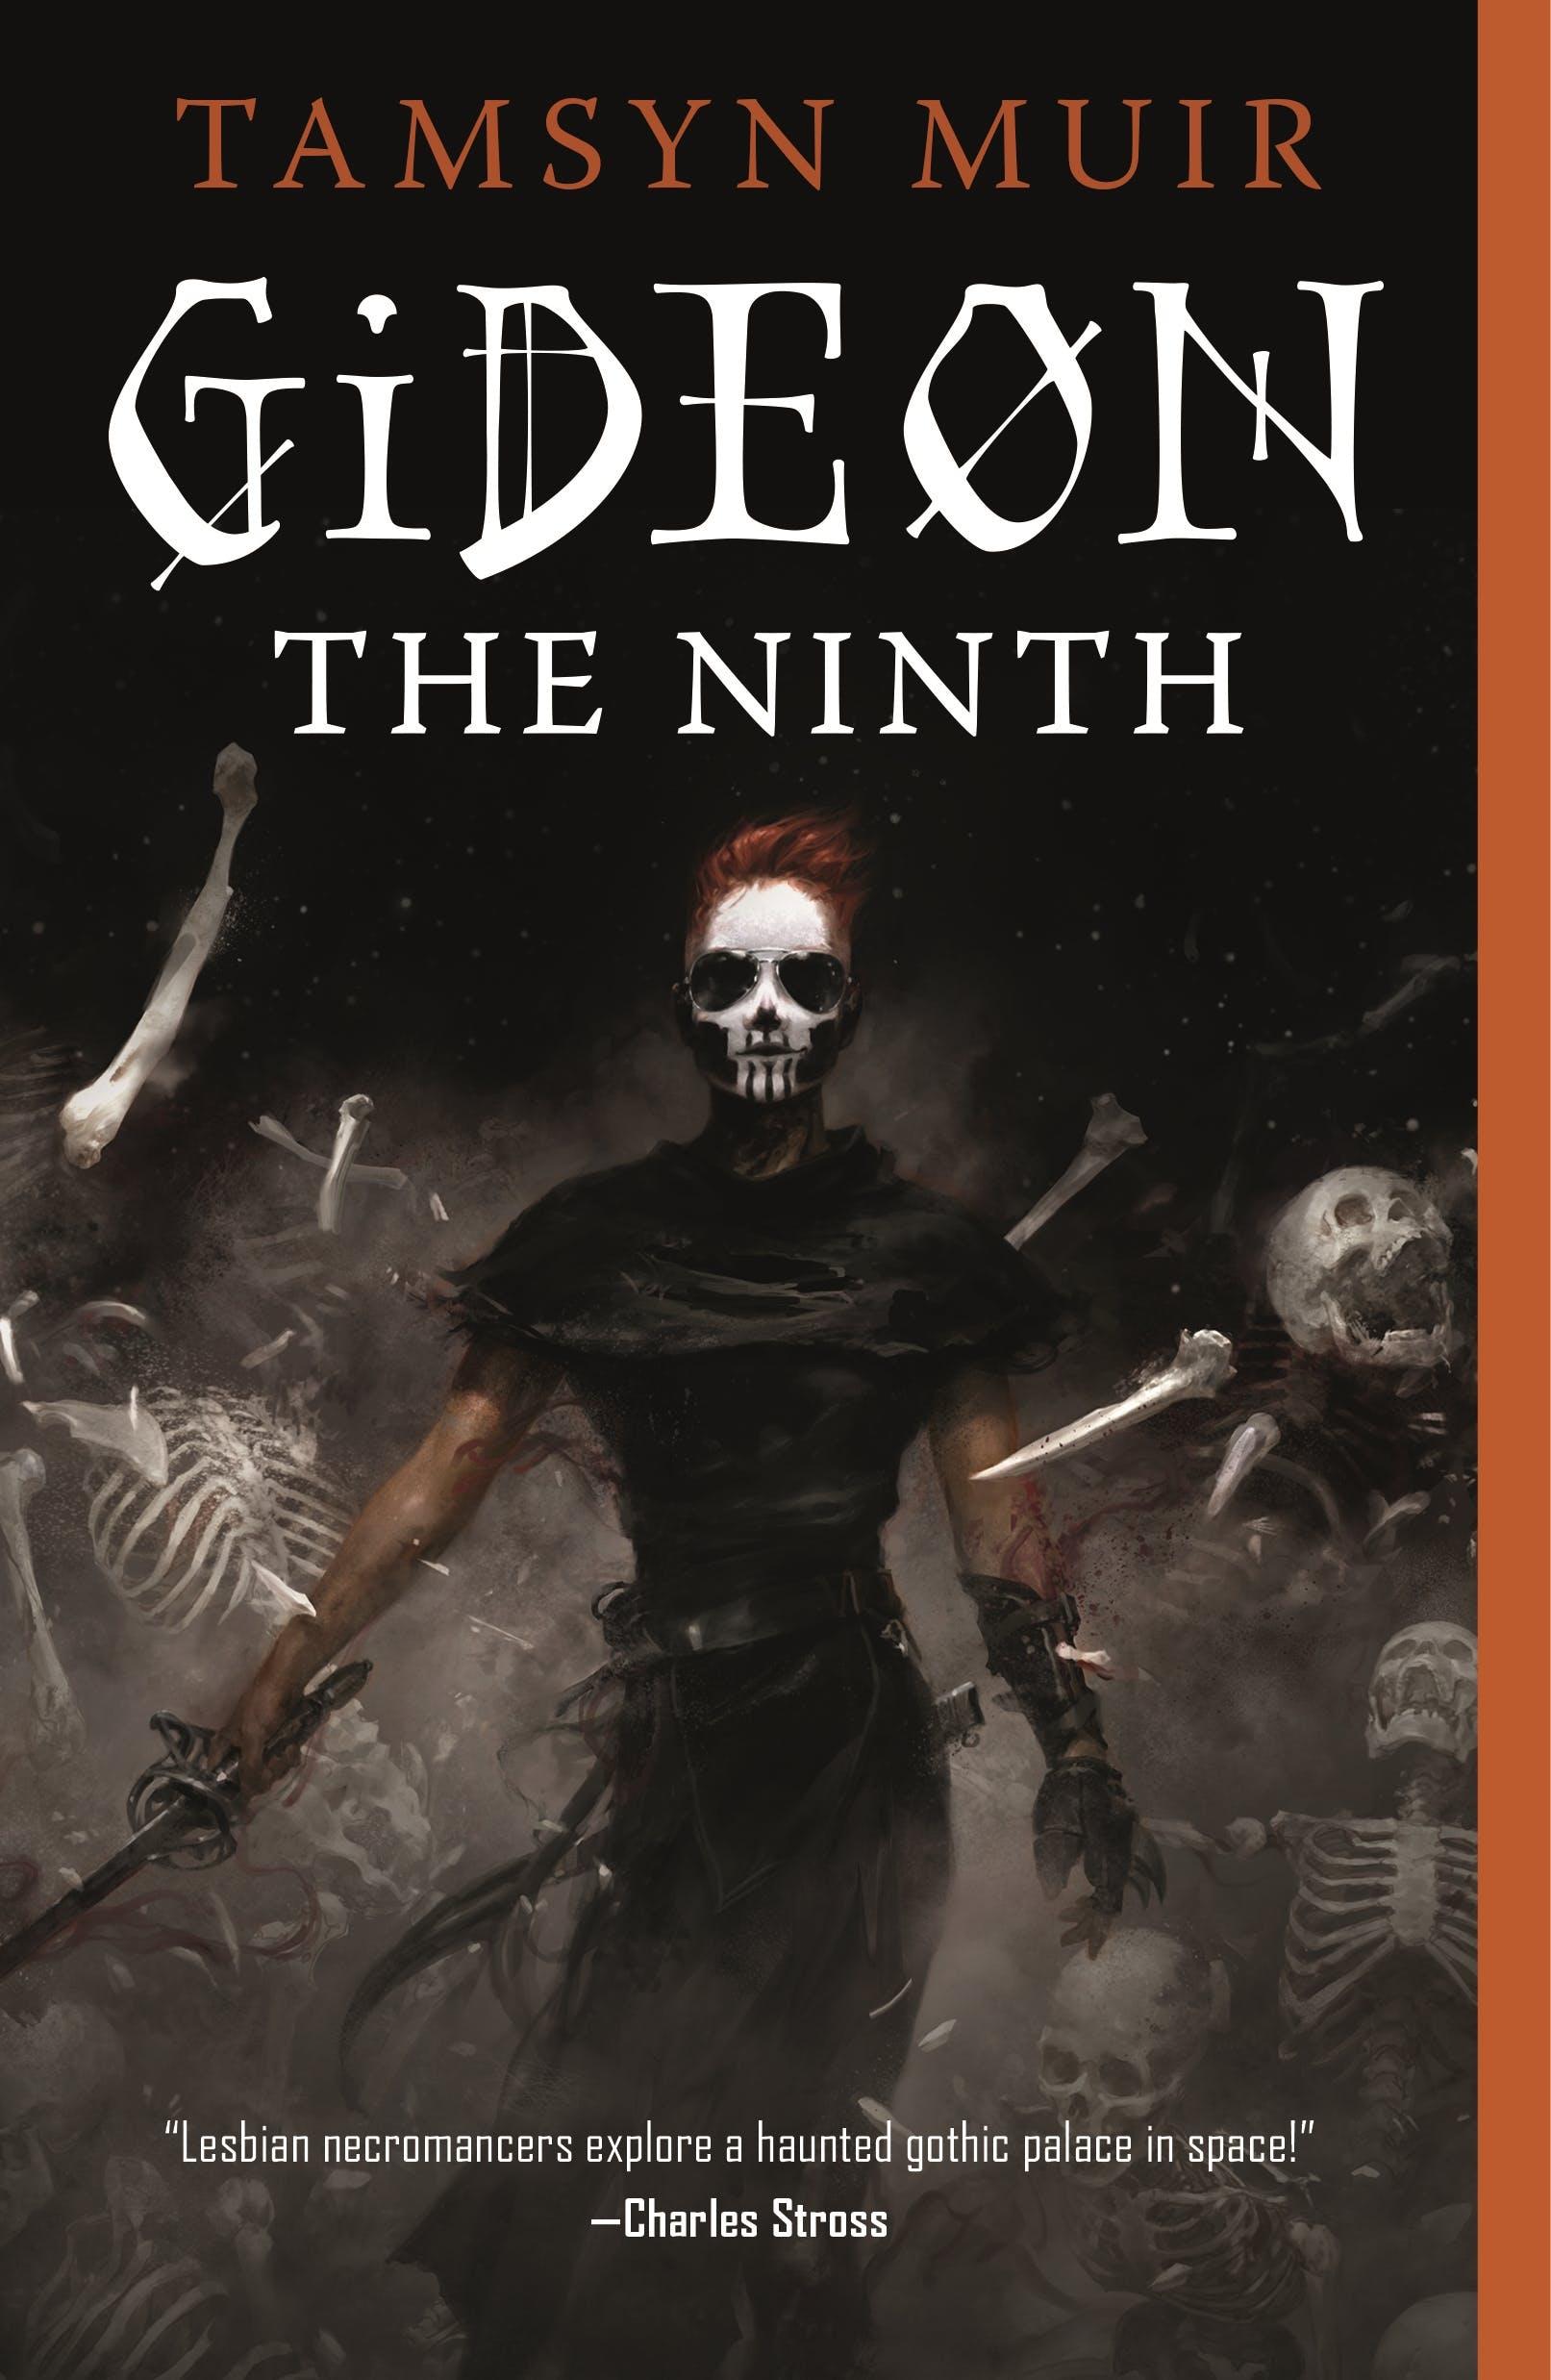 Image of Gideon the Ninth